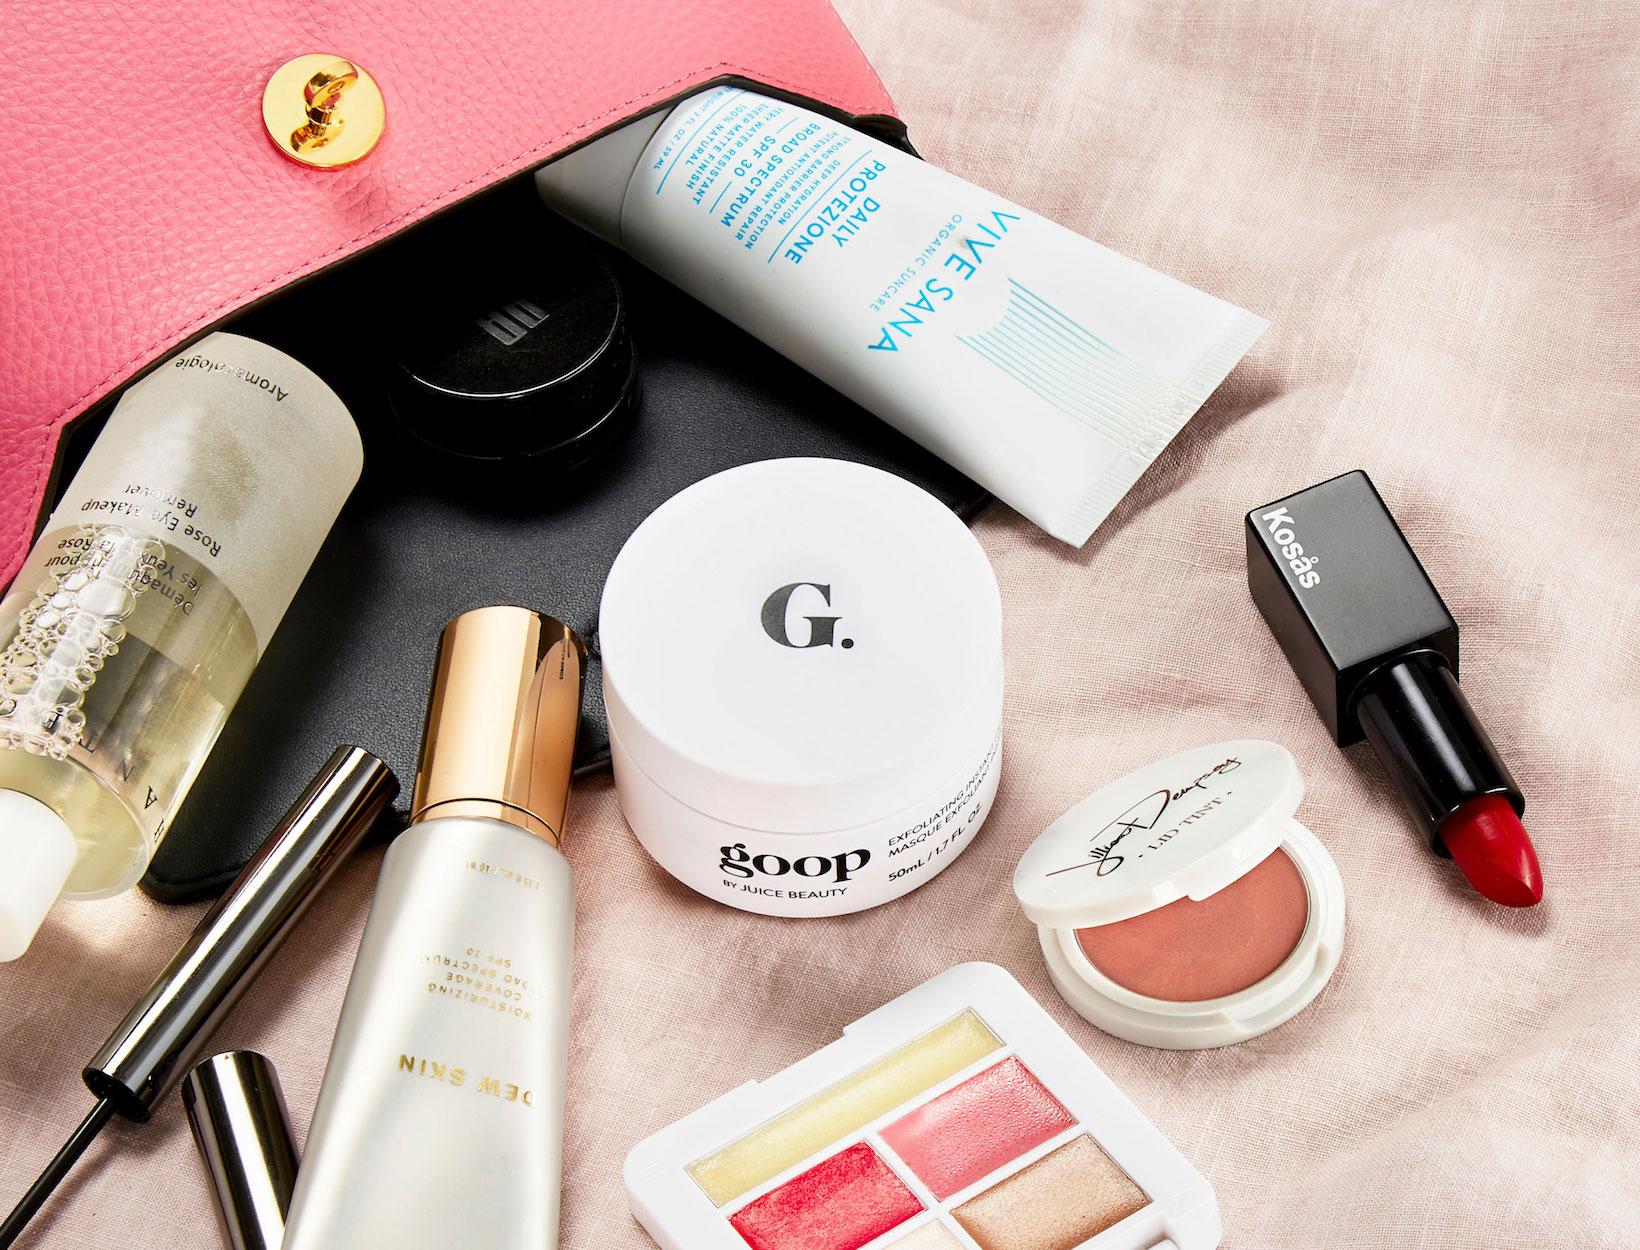 5a9dcbc03b1e Detox Your Makeup Bag: 12 Clean Beauty All-Stars | Goop